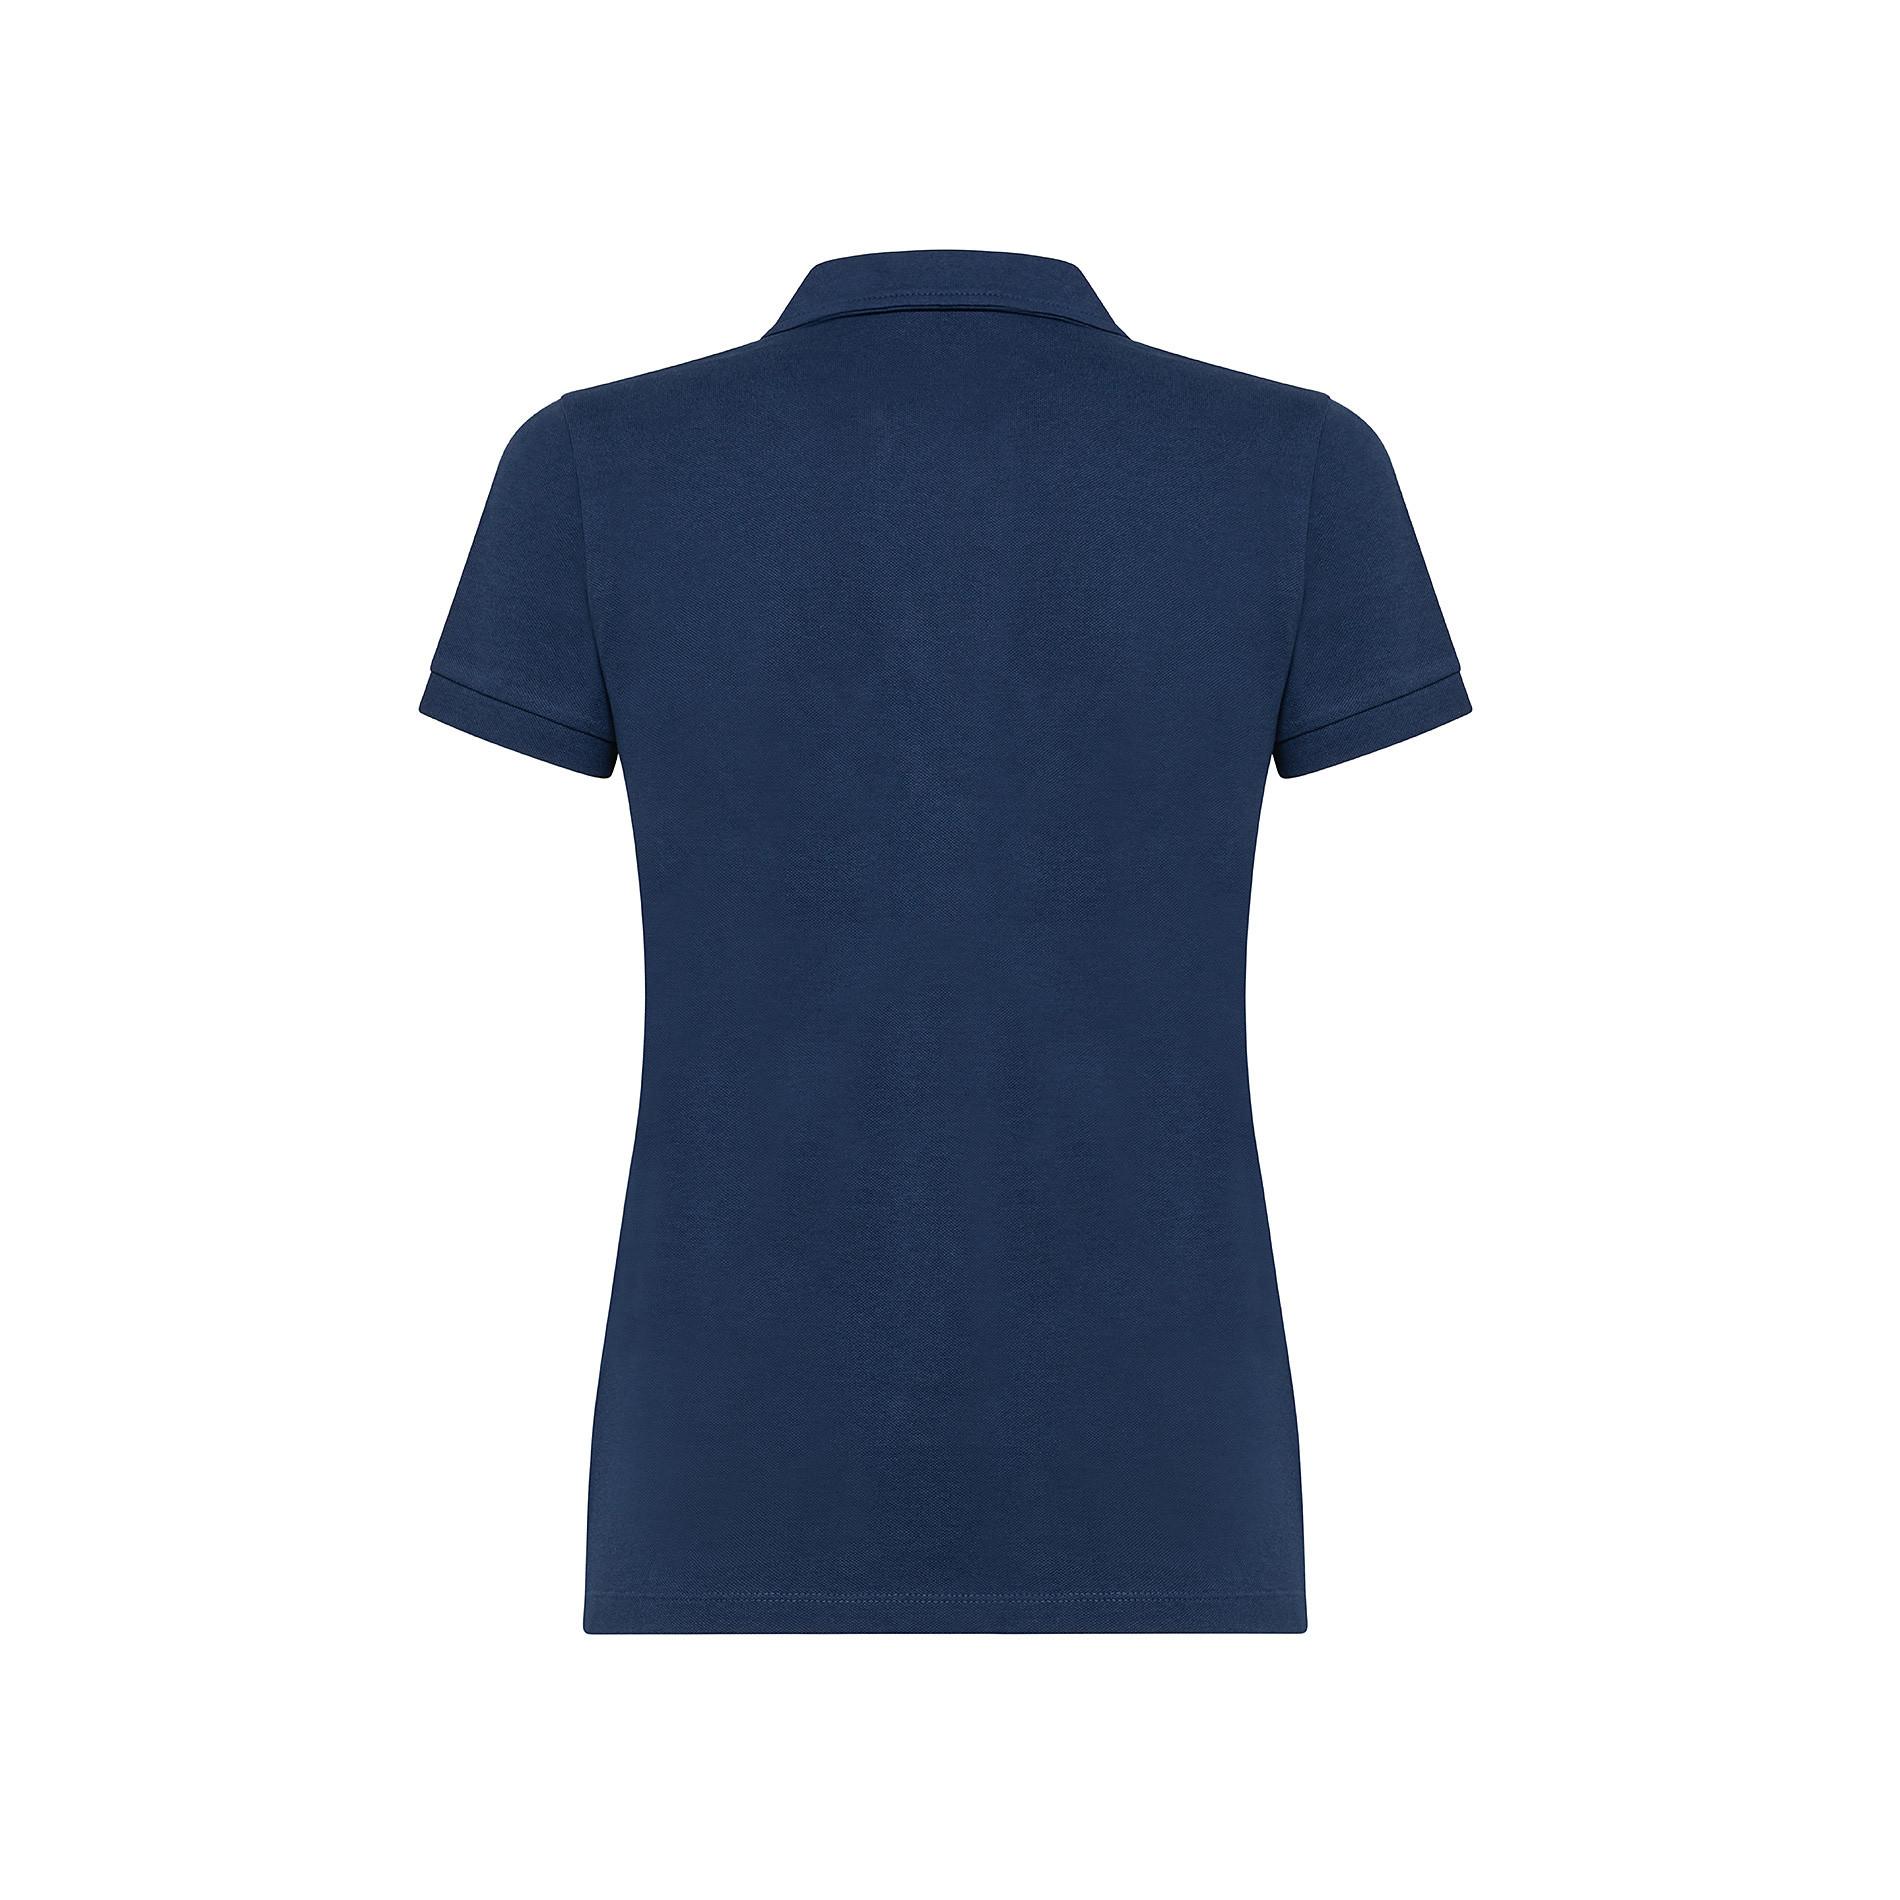 Polo cotone tinta unita, Blu, large image number 1